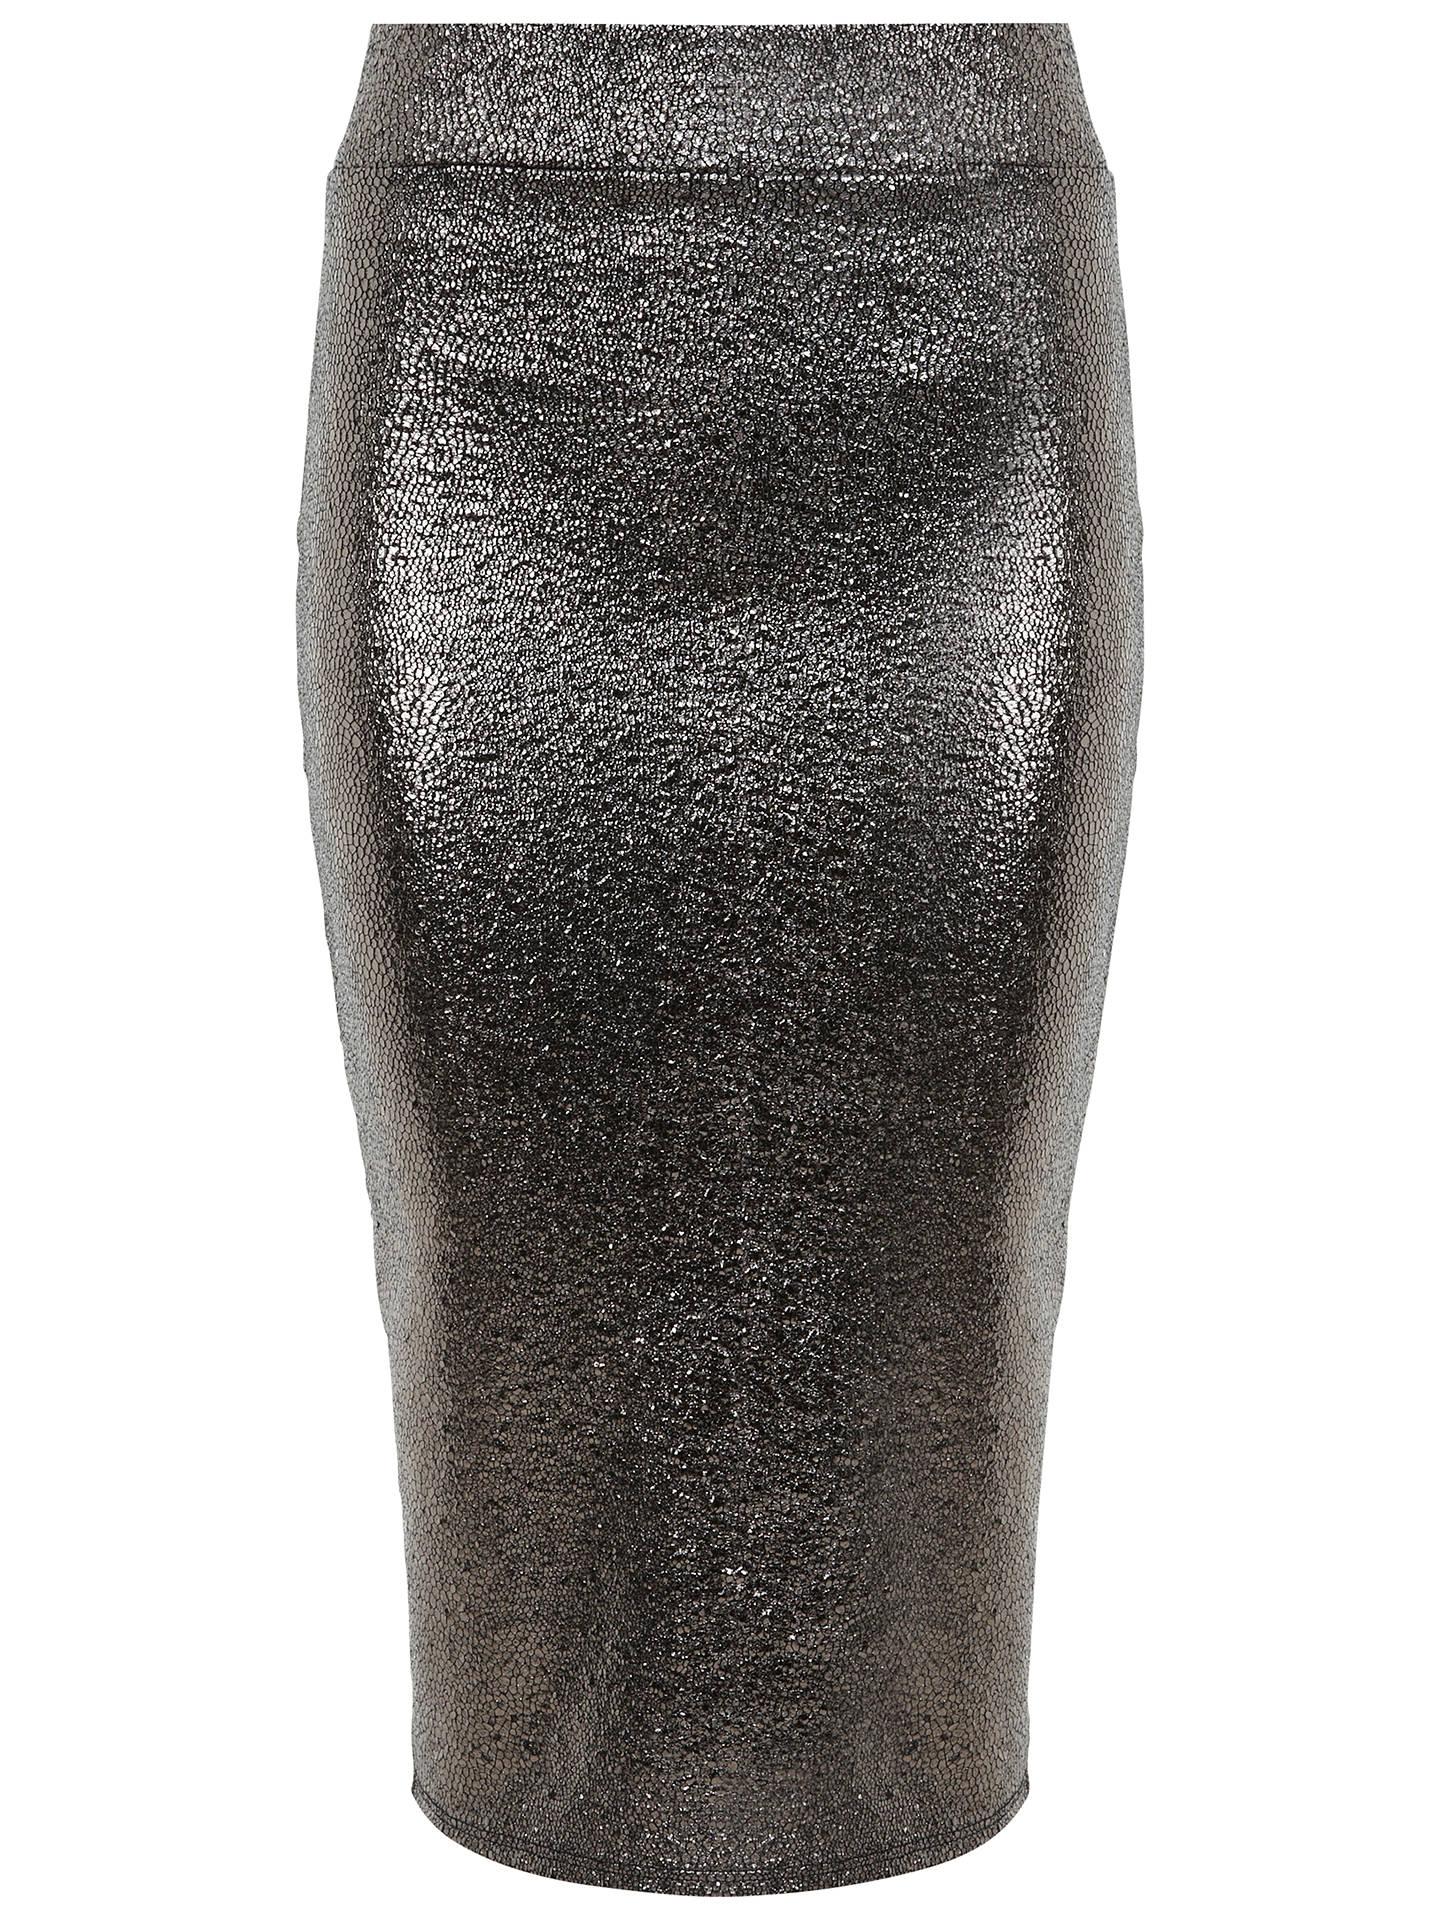 5683646f9d8 BuyMiss Selfridge Metallic Pencil Skirt